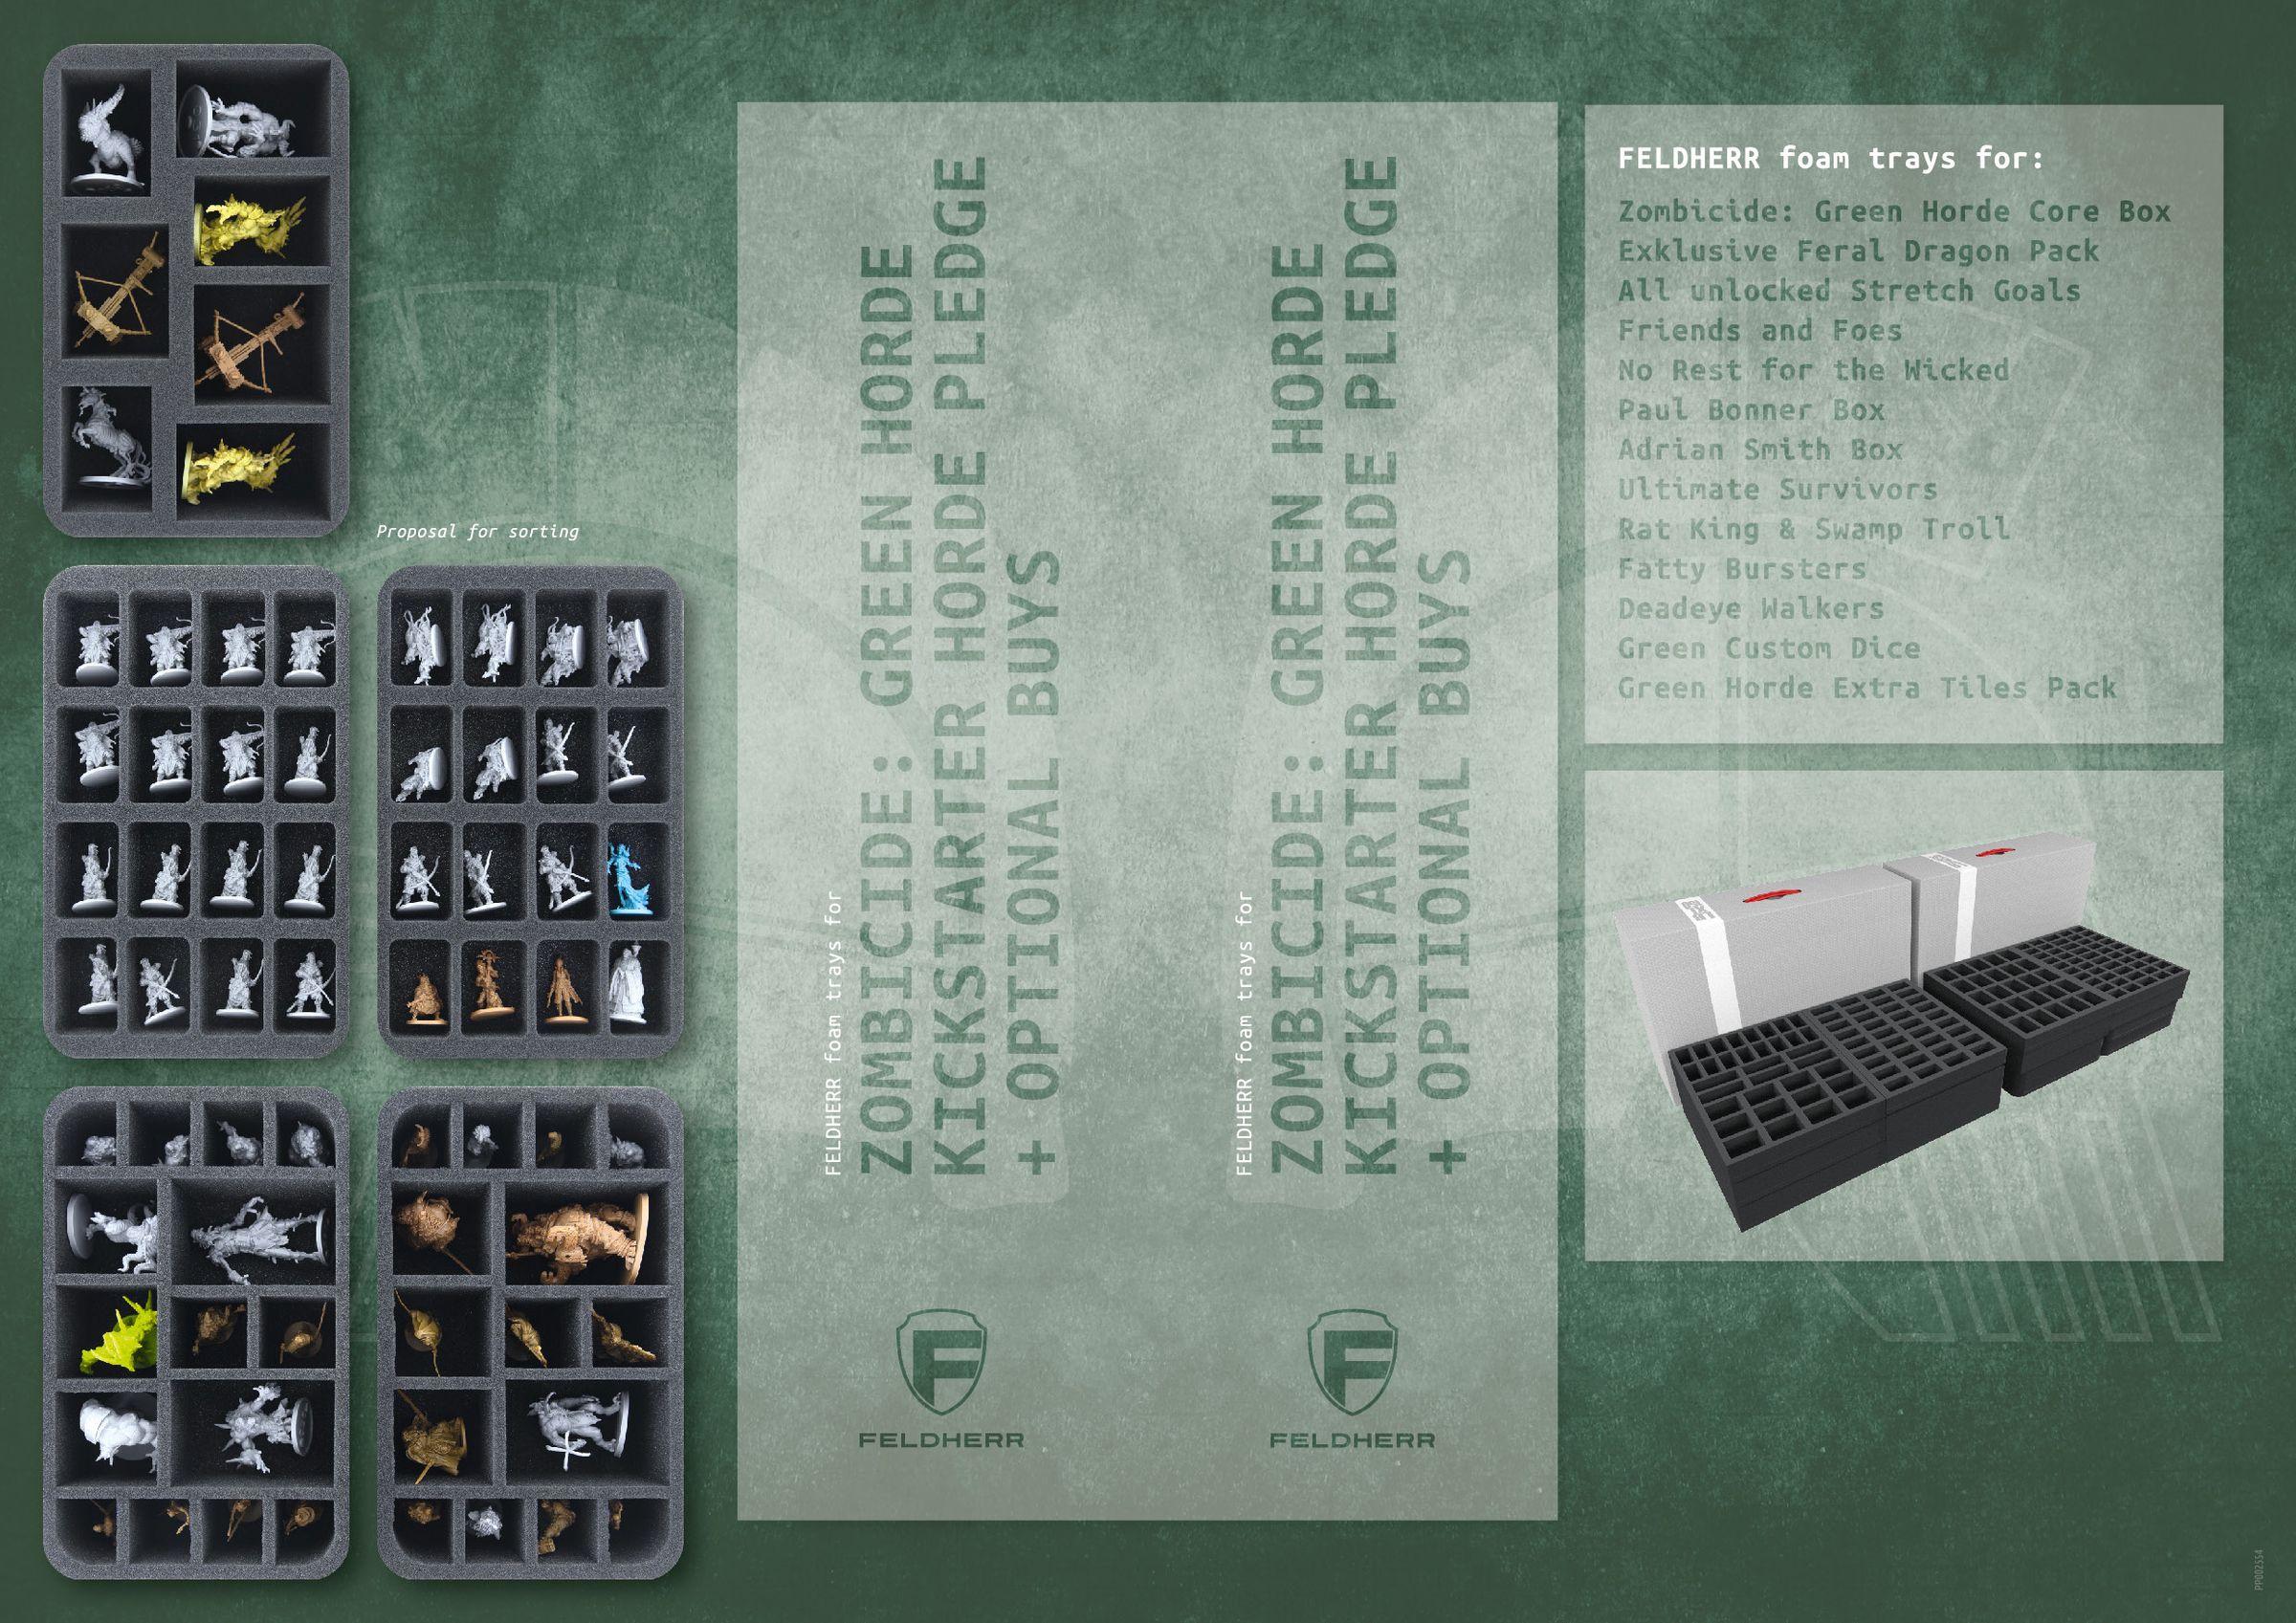 PP002554 - Flyer for Zombicide: Green Horde Kickstarter Horde Pledge + Optional Buys